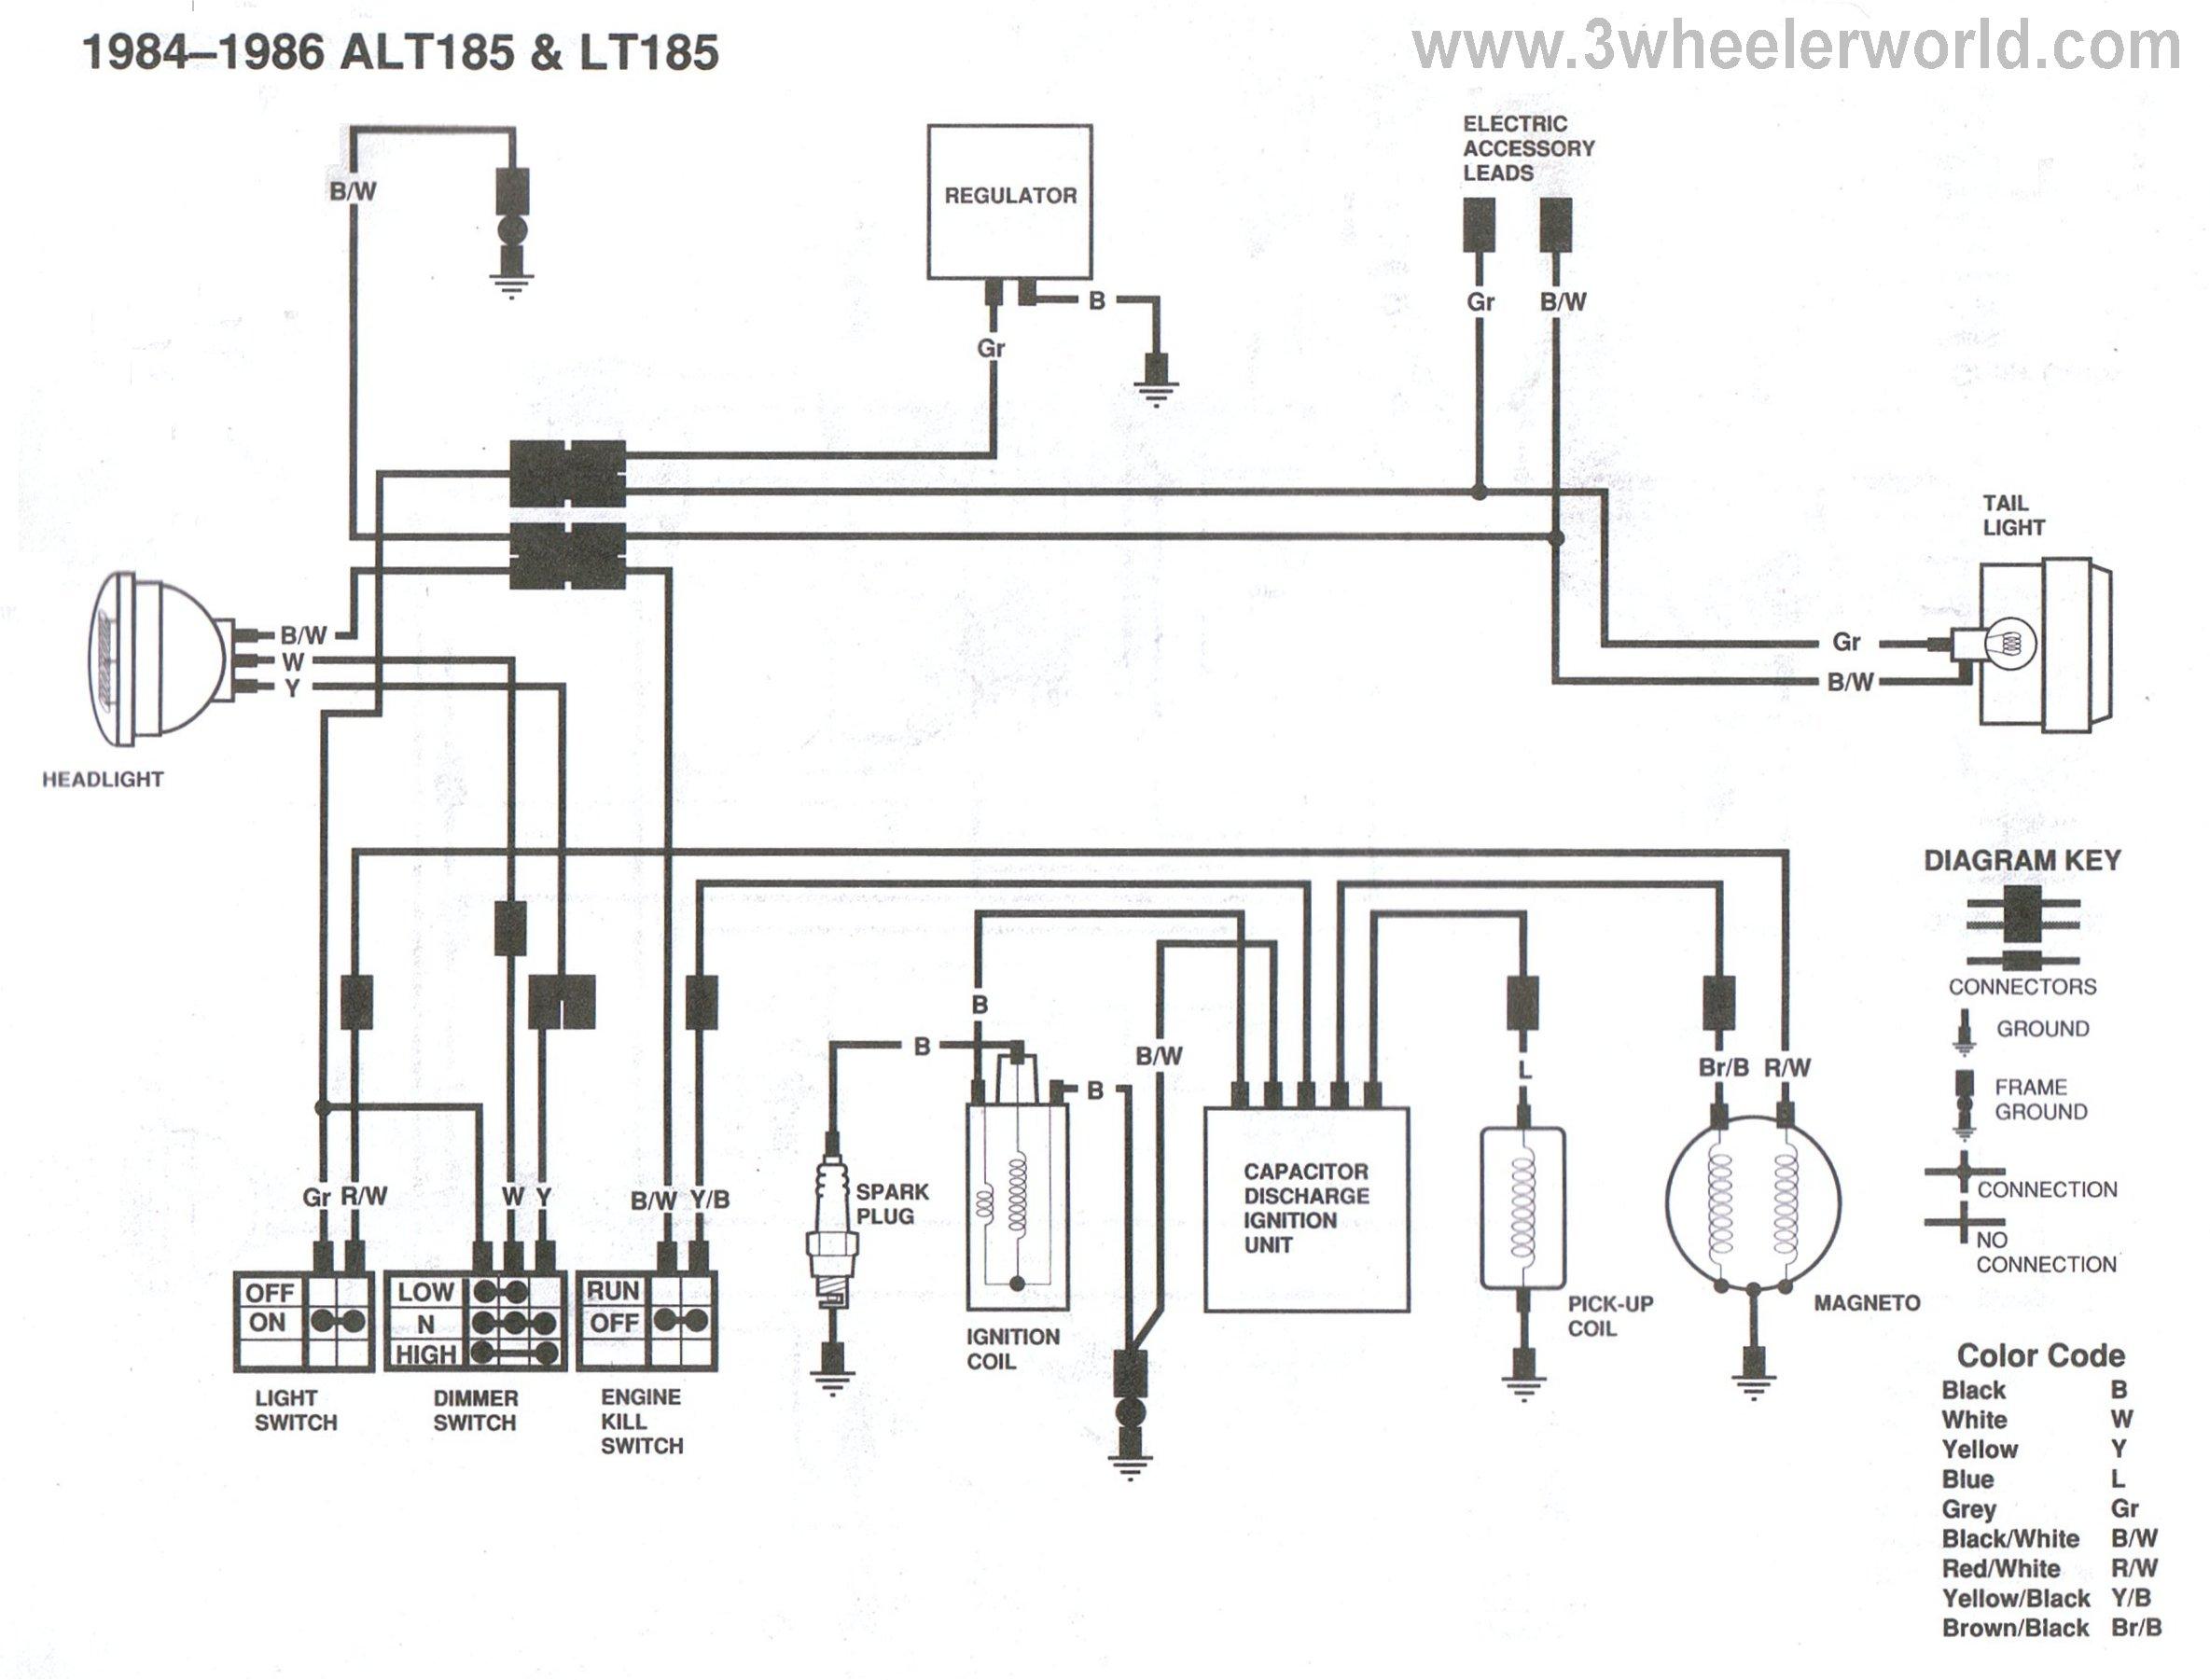 Exelent Drz 400 Wiring Diagram Illustration - Wiring Diagram Ideas ...